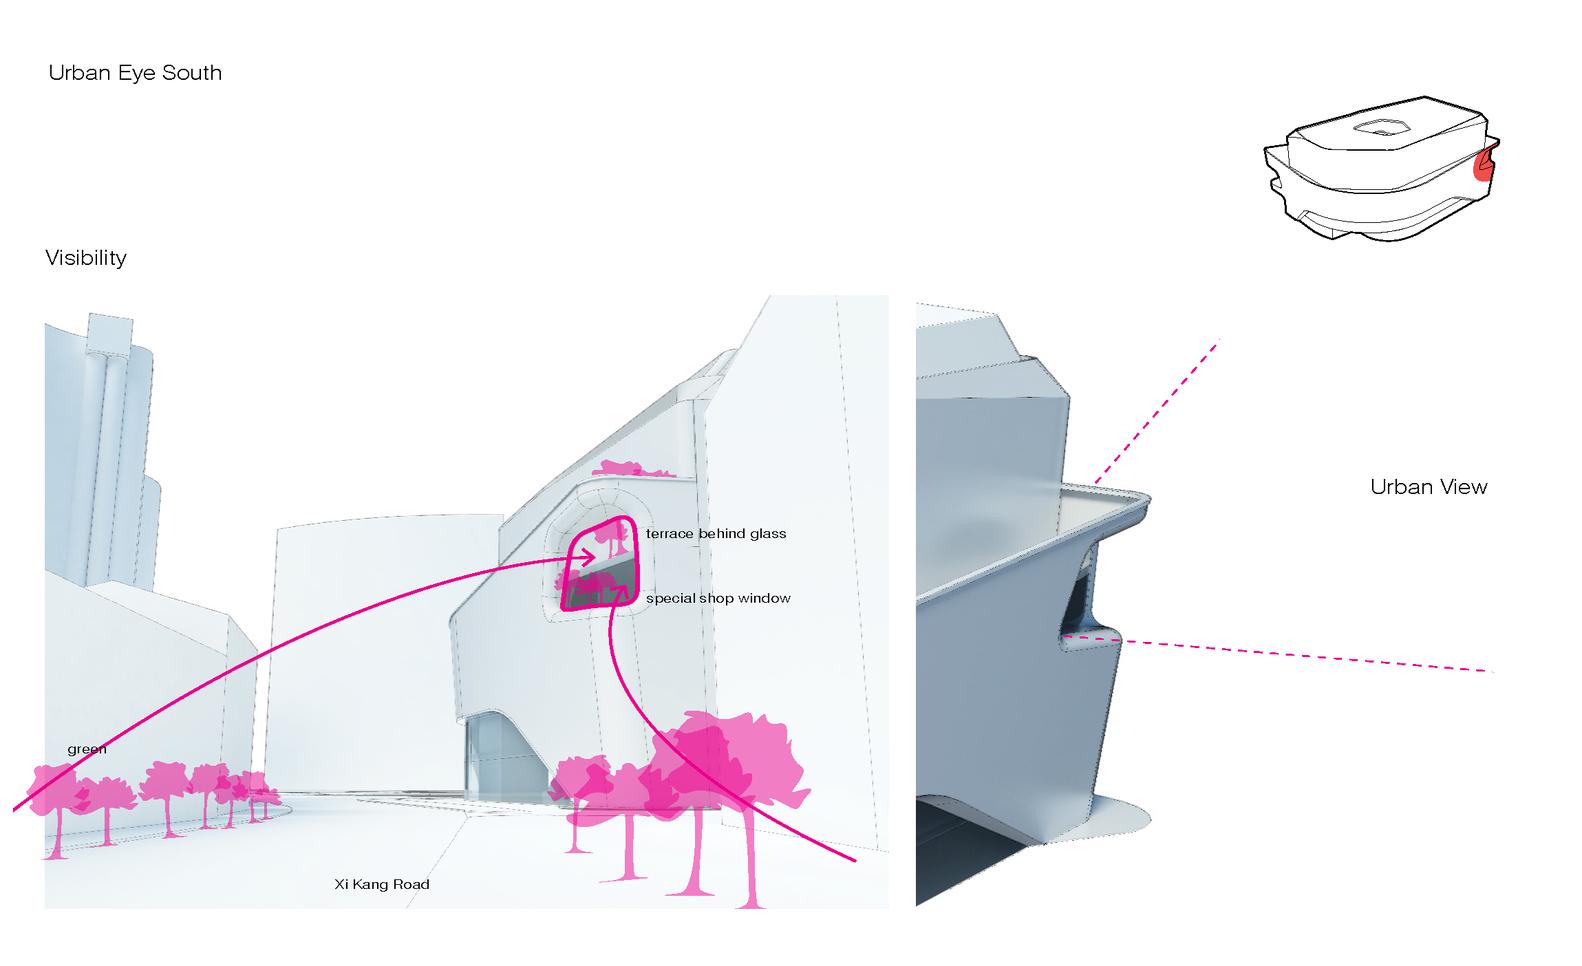 diagram_urban_eye_south